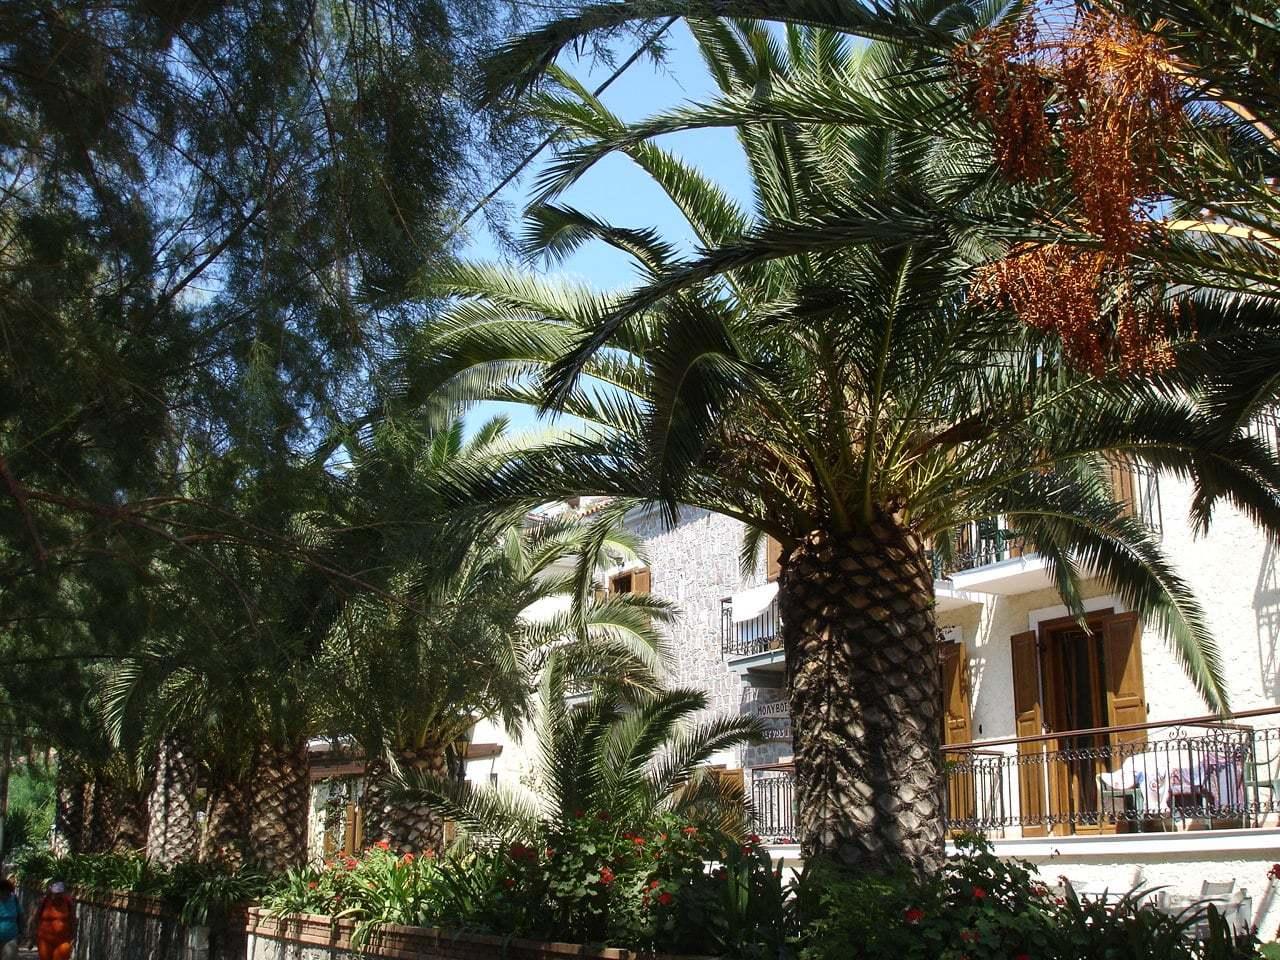 yunanistan palmiyeler